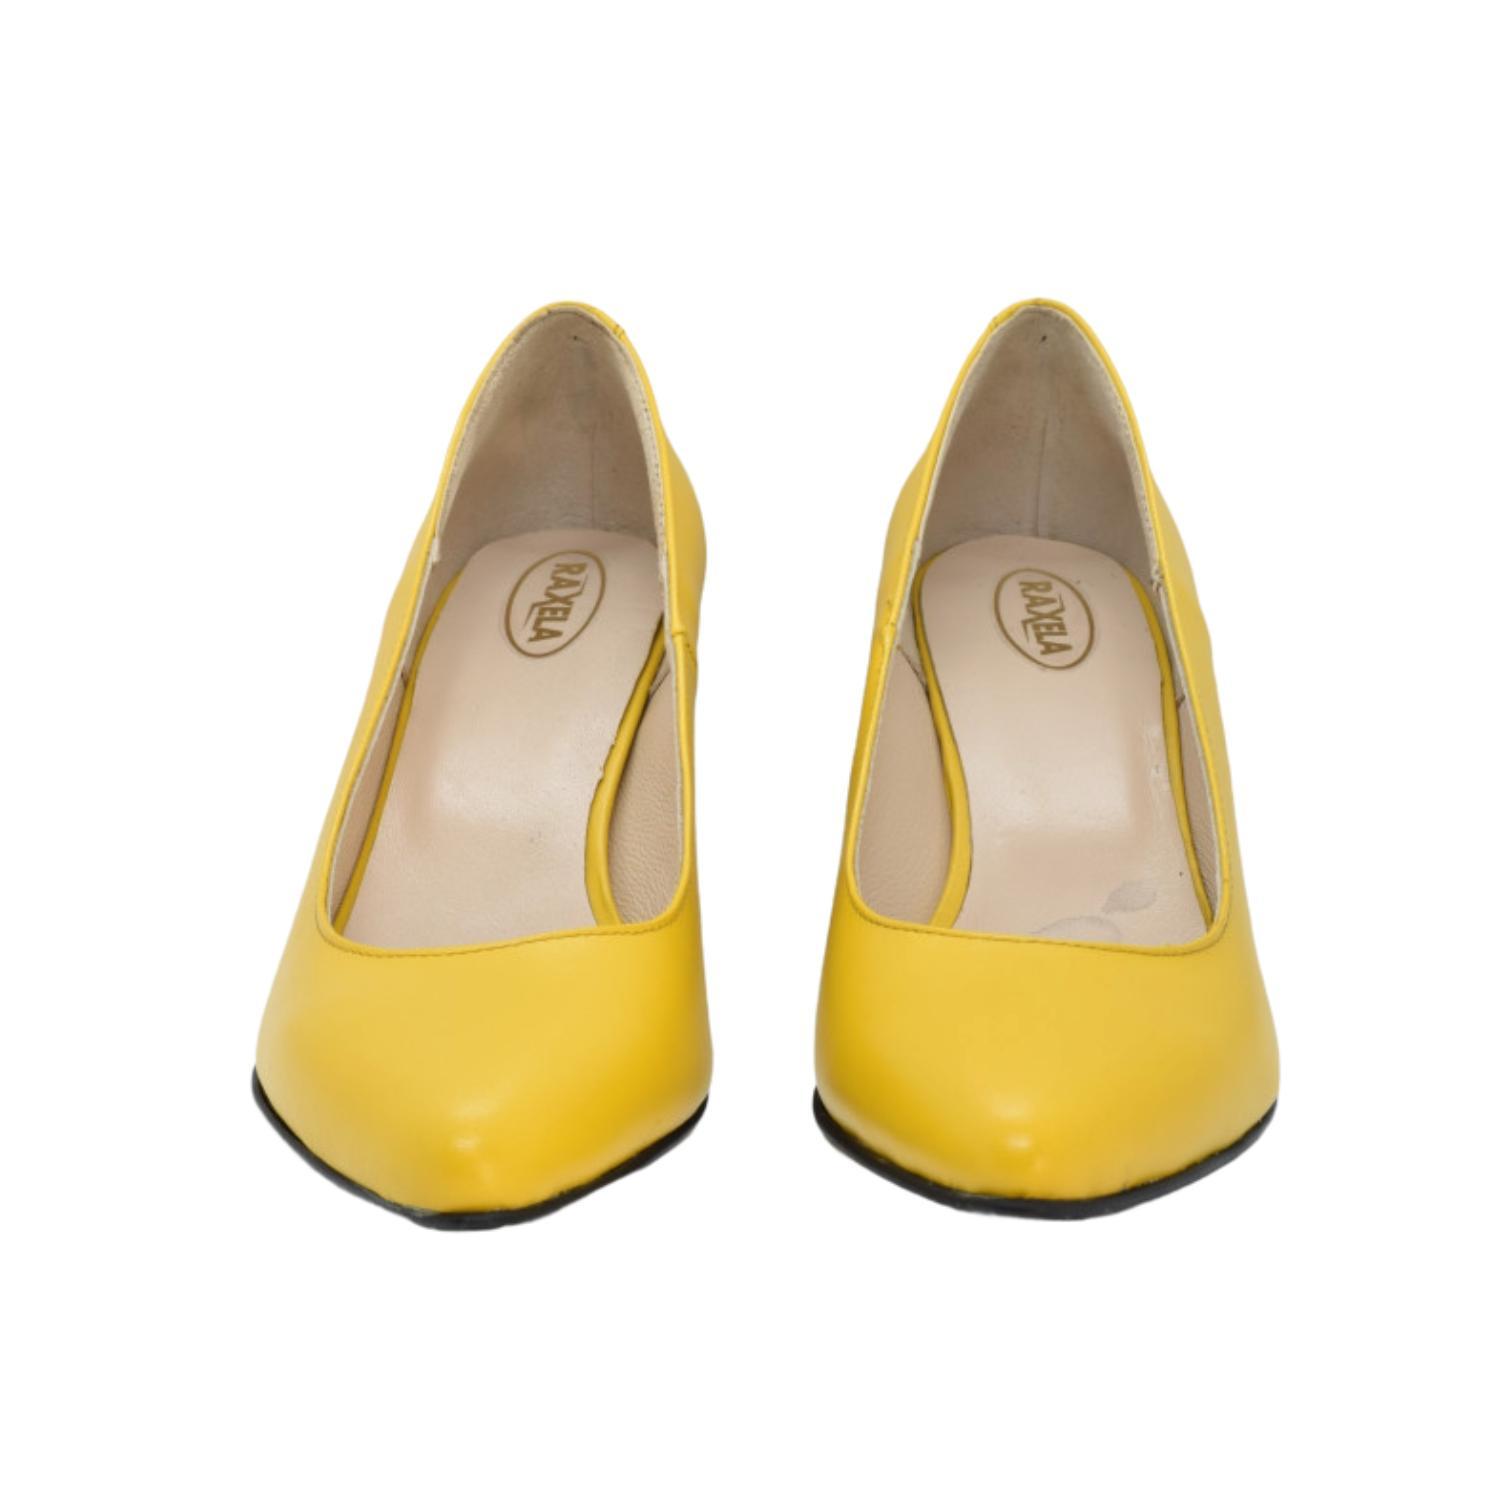 Pantofi galbeni cu toc colorat abstract